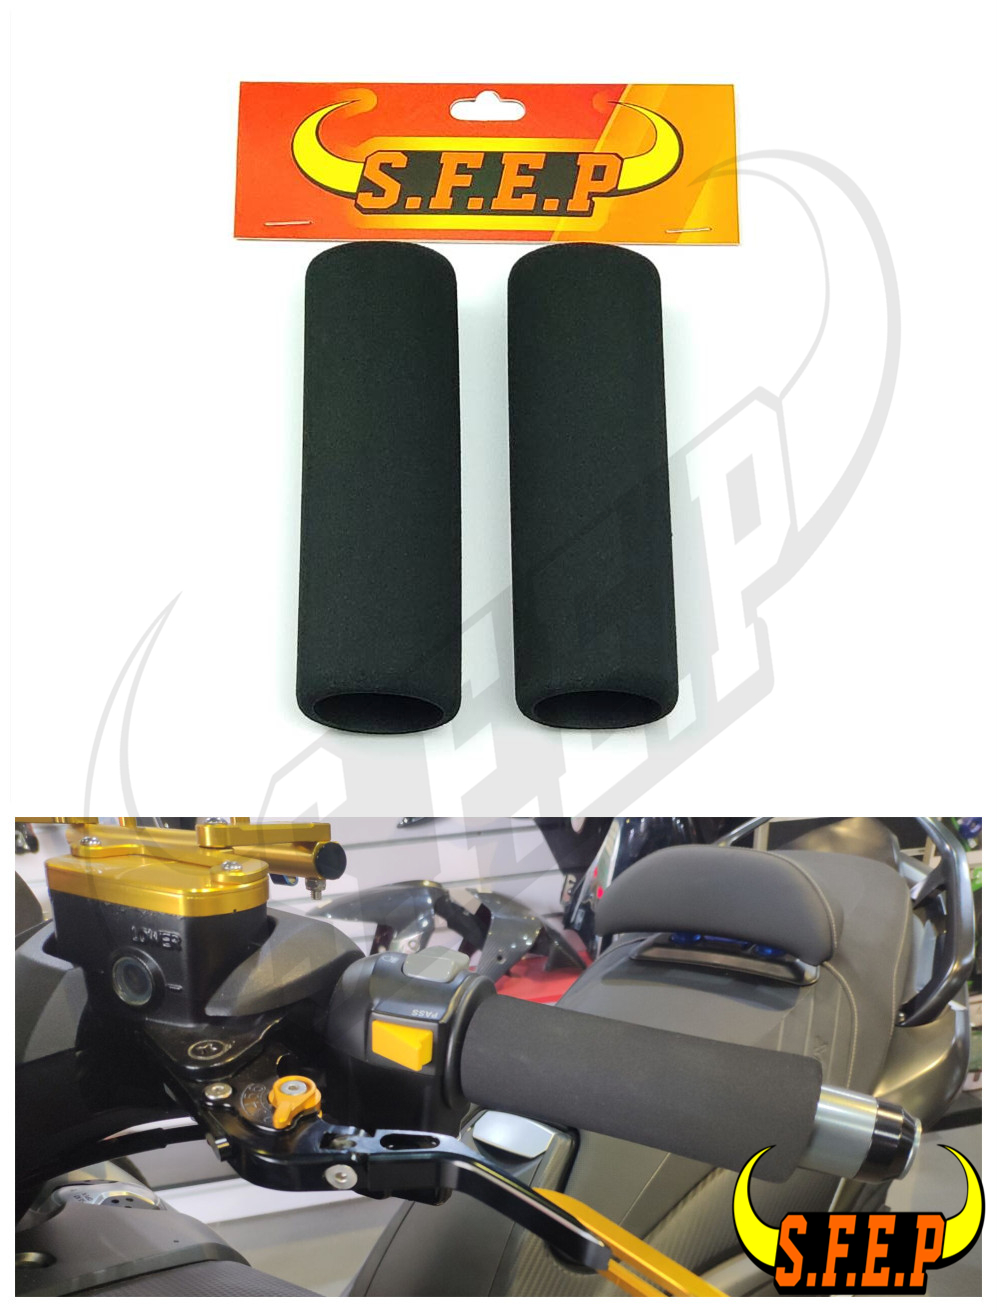 Universal Foam Anit-Vibration Motorcycle Comfort Grip Covers For BMW S1000R S1000RR HP4 R1200GS K1300 S K1200S F650GS F800GT